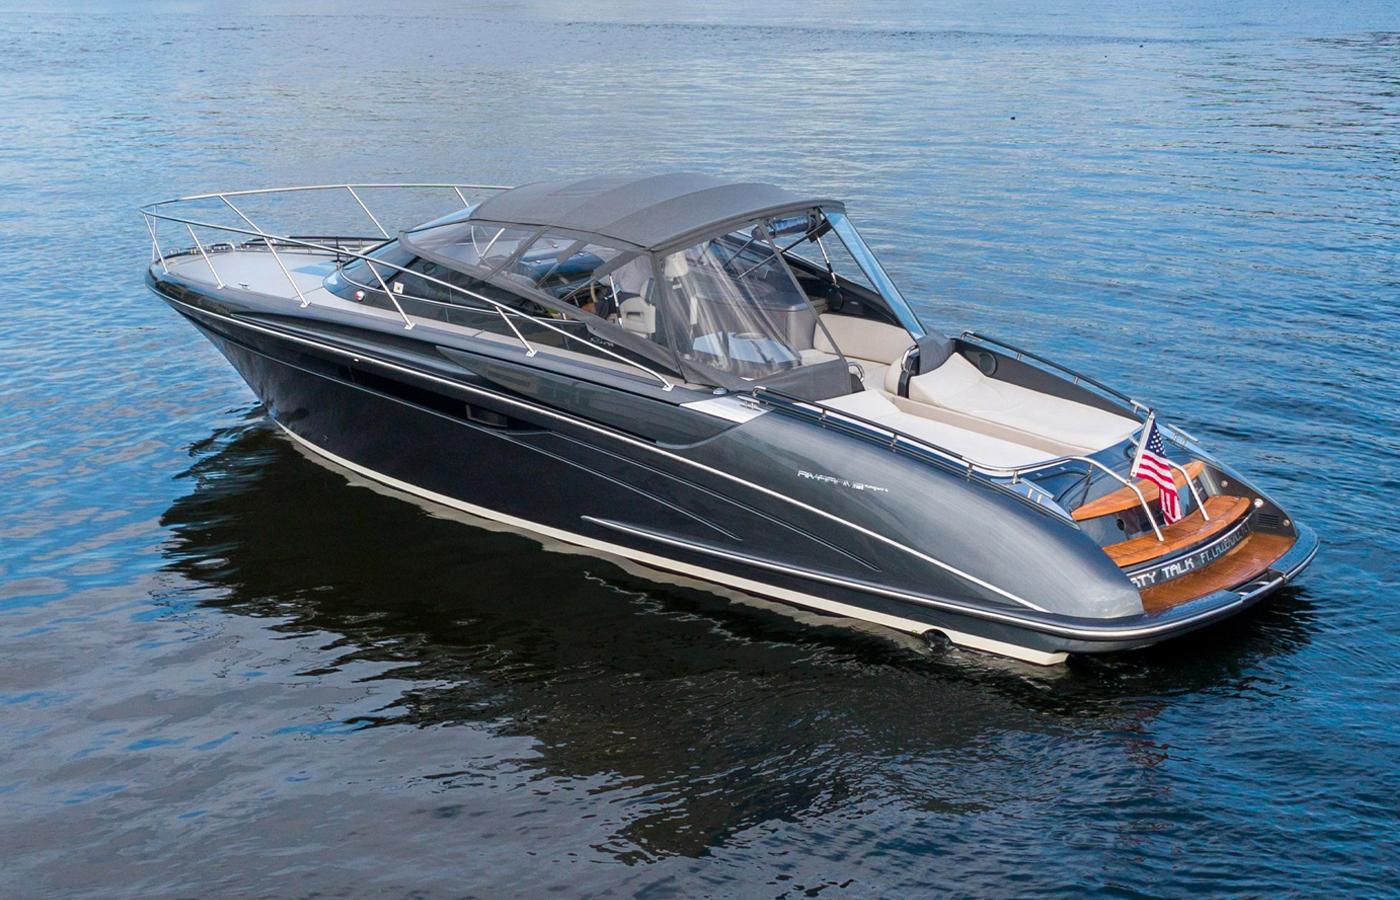 Rivarama 44 Motor Yacht Highlight [Boat Review + Video]